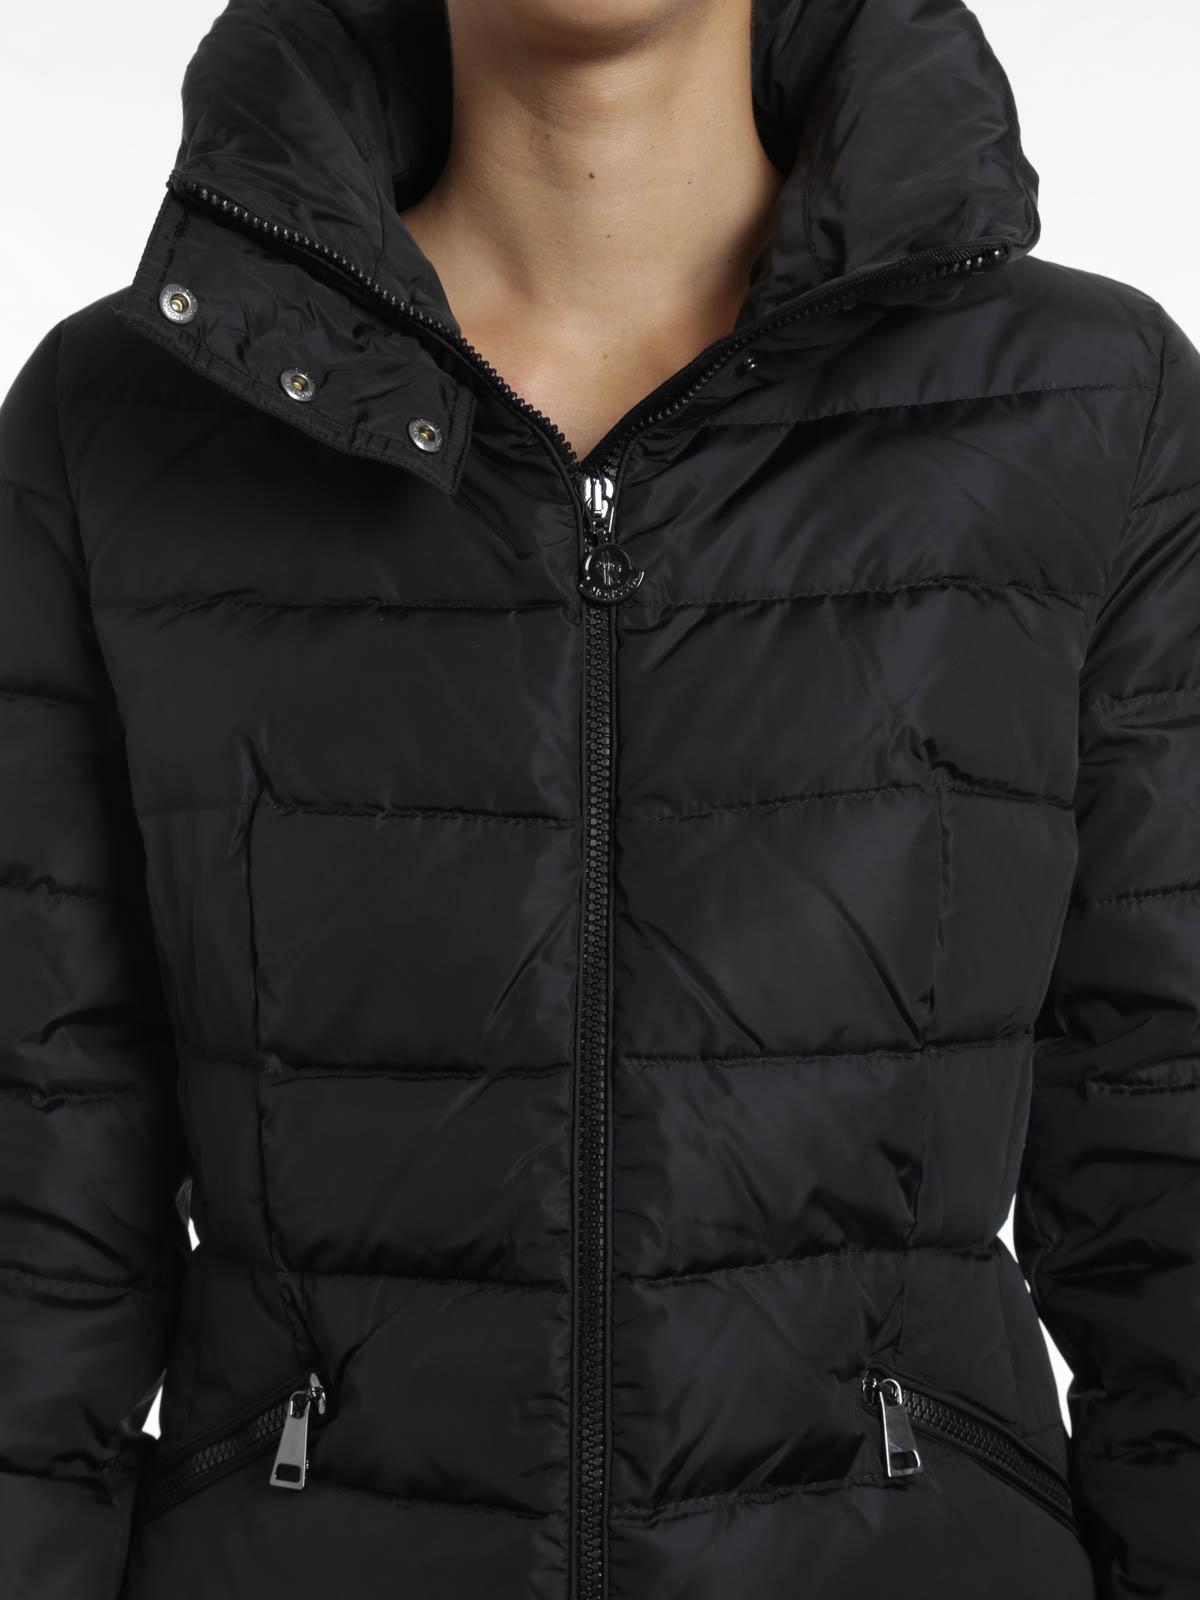 ff998ba898cd Moncler - Flammette down coat - padded coats - B2 093 4993105 54155 999